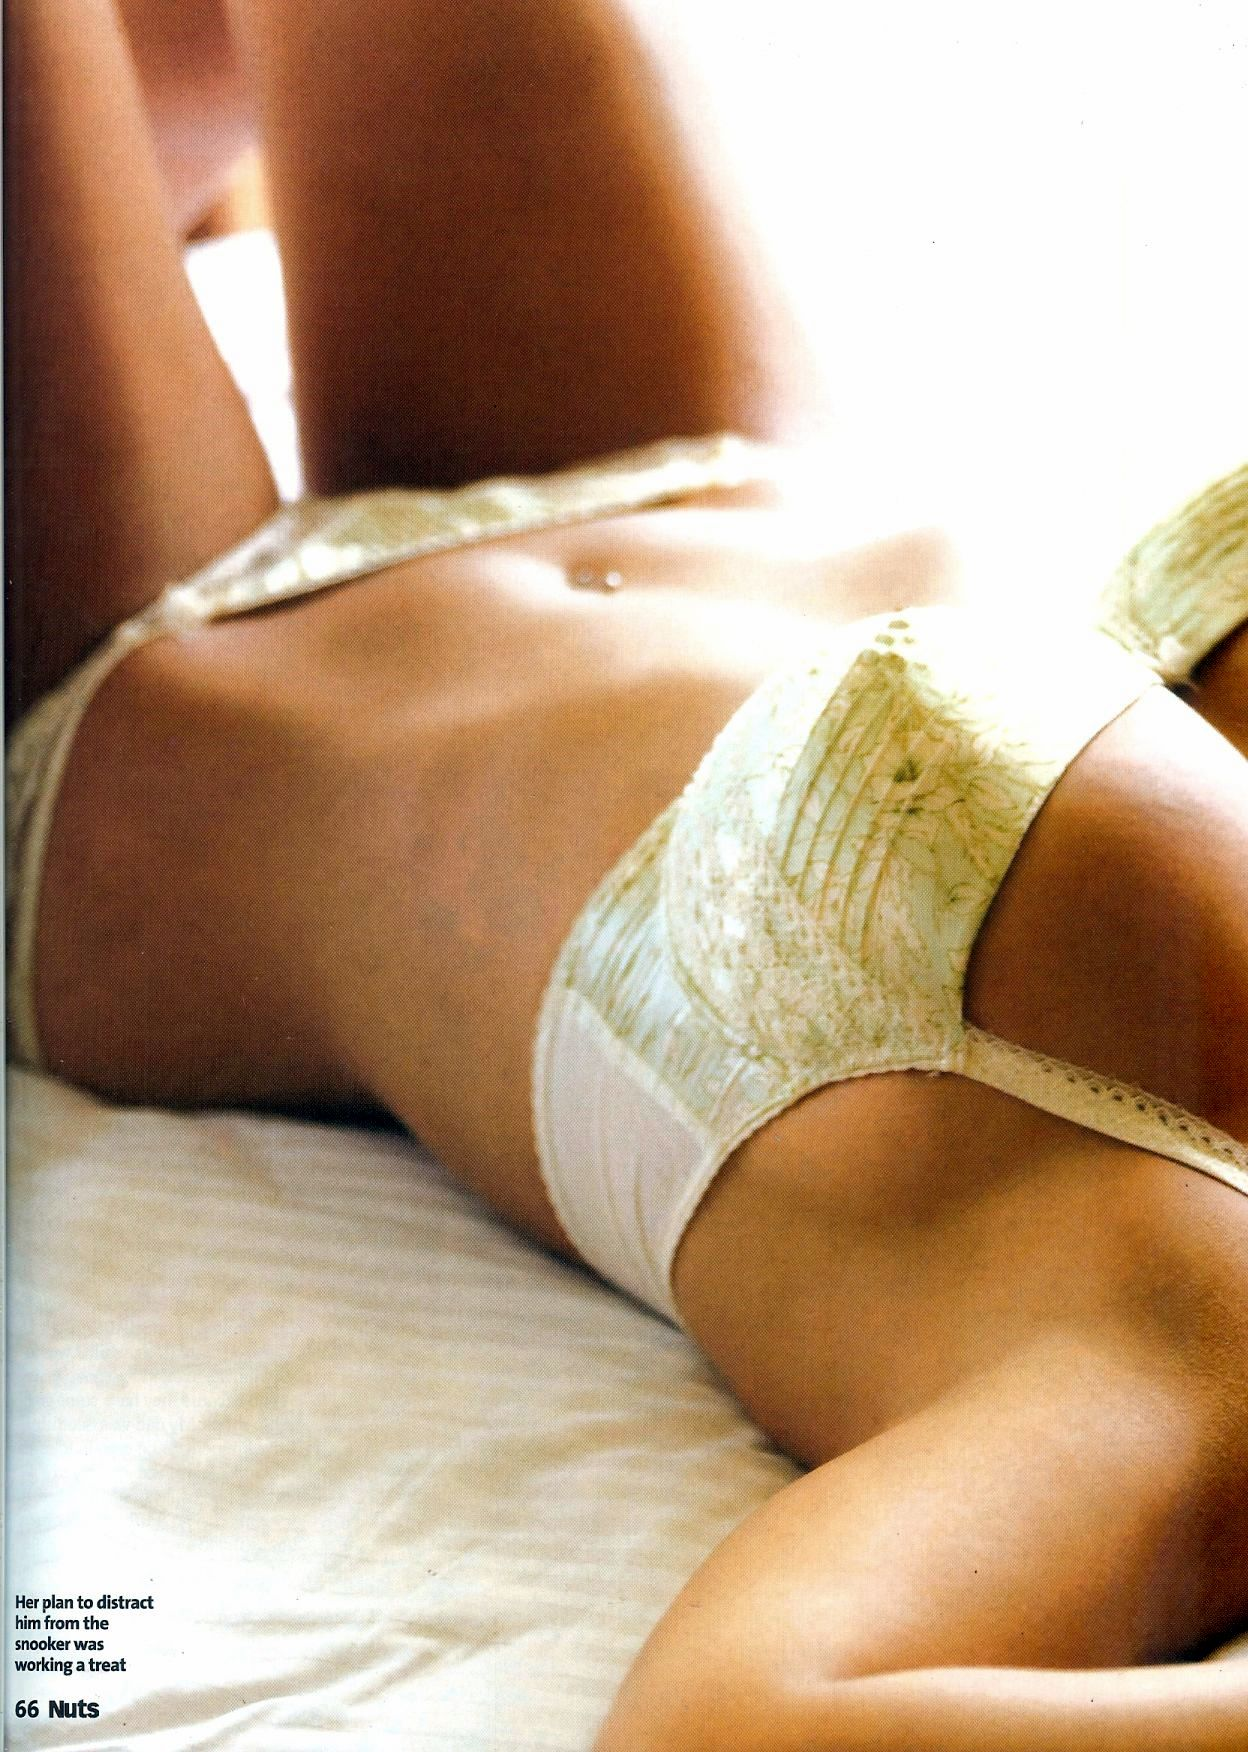 06091_Gemma_Atkinson_Nuts_magazine-6_122_148lo.jpg